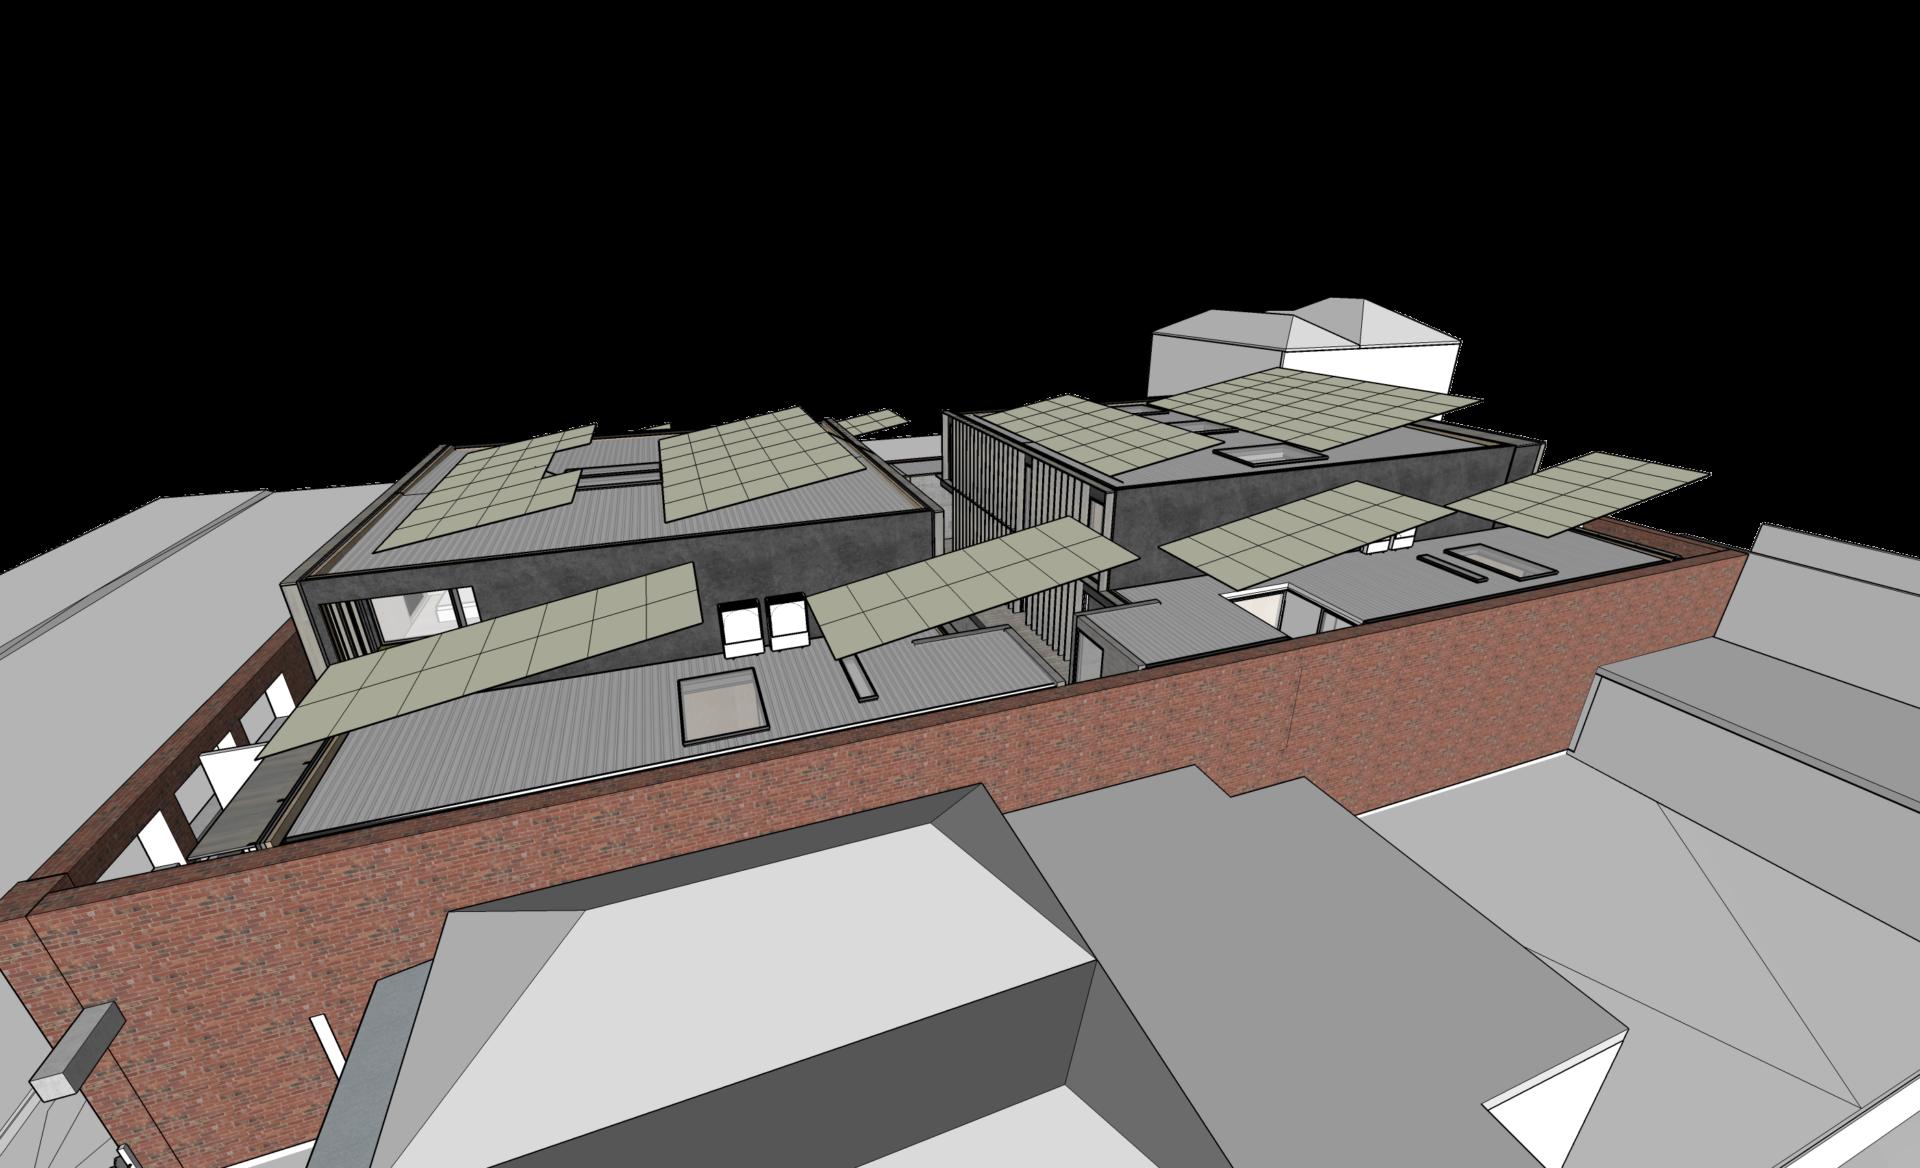 solar roof concept 2